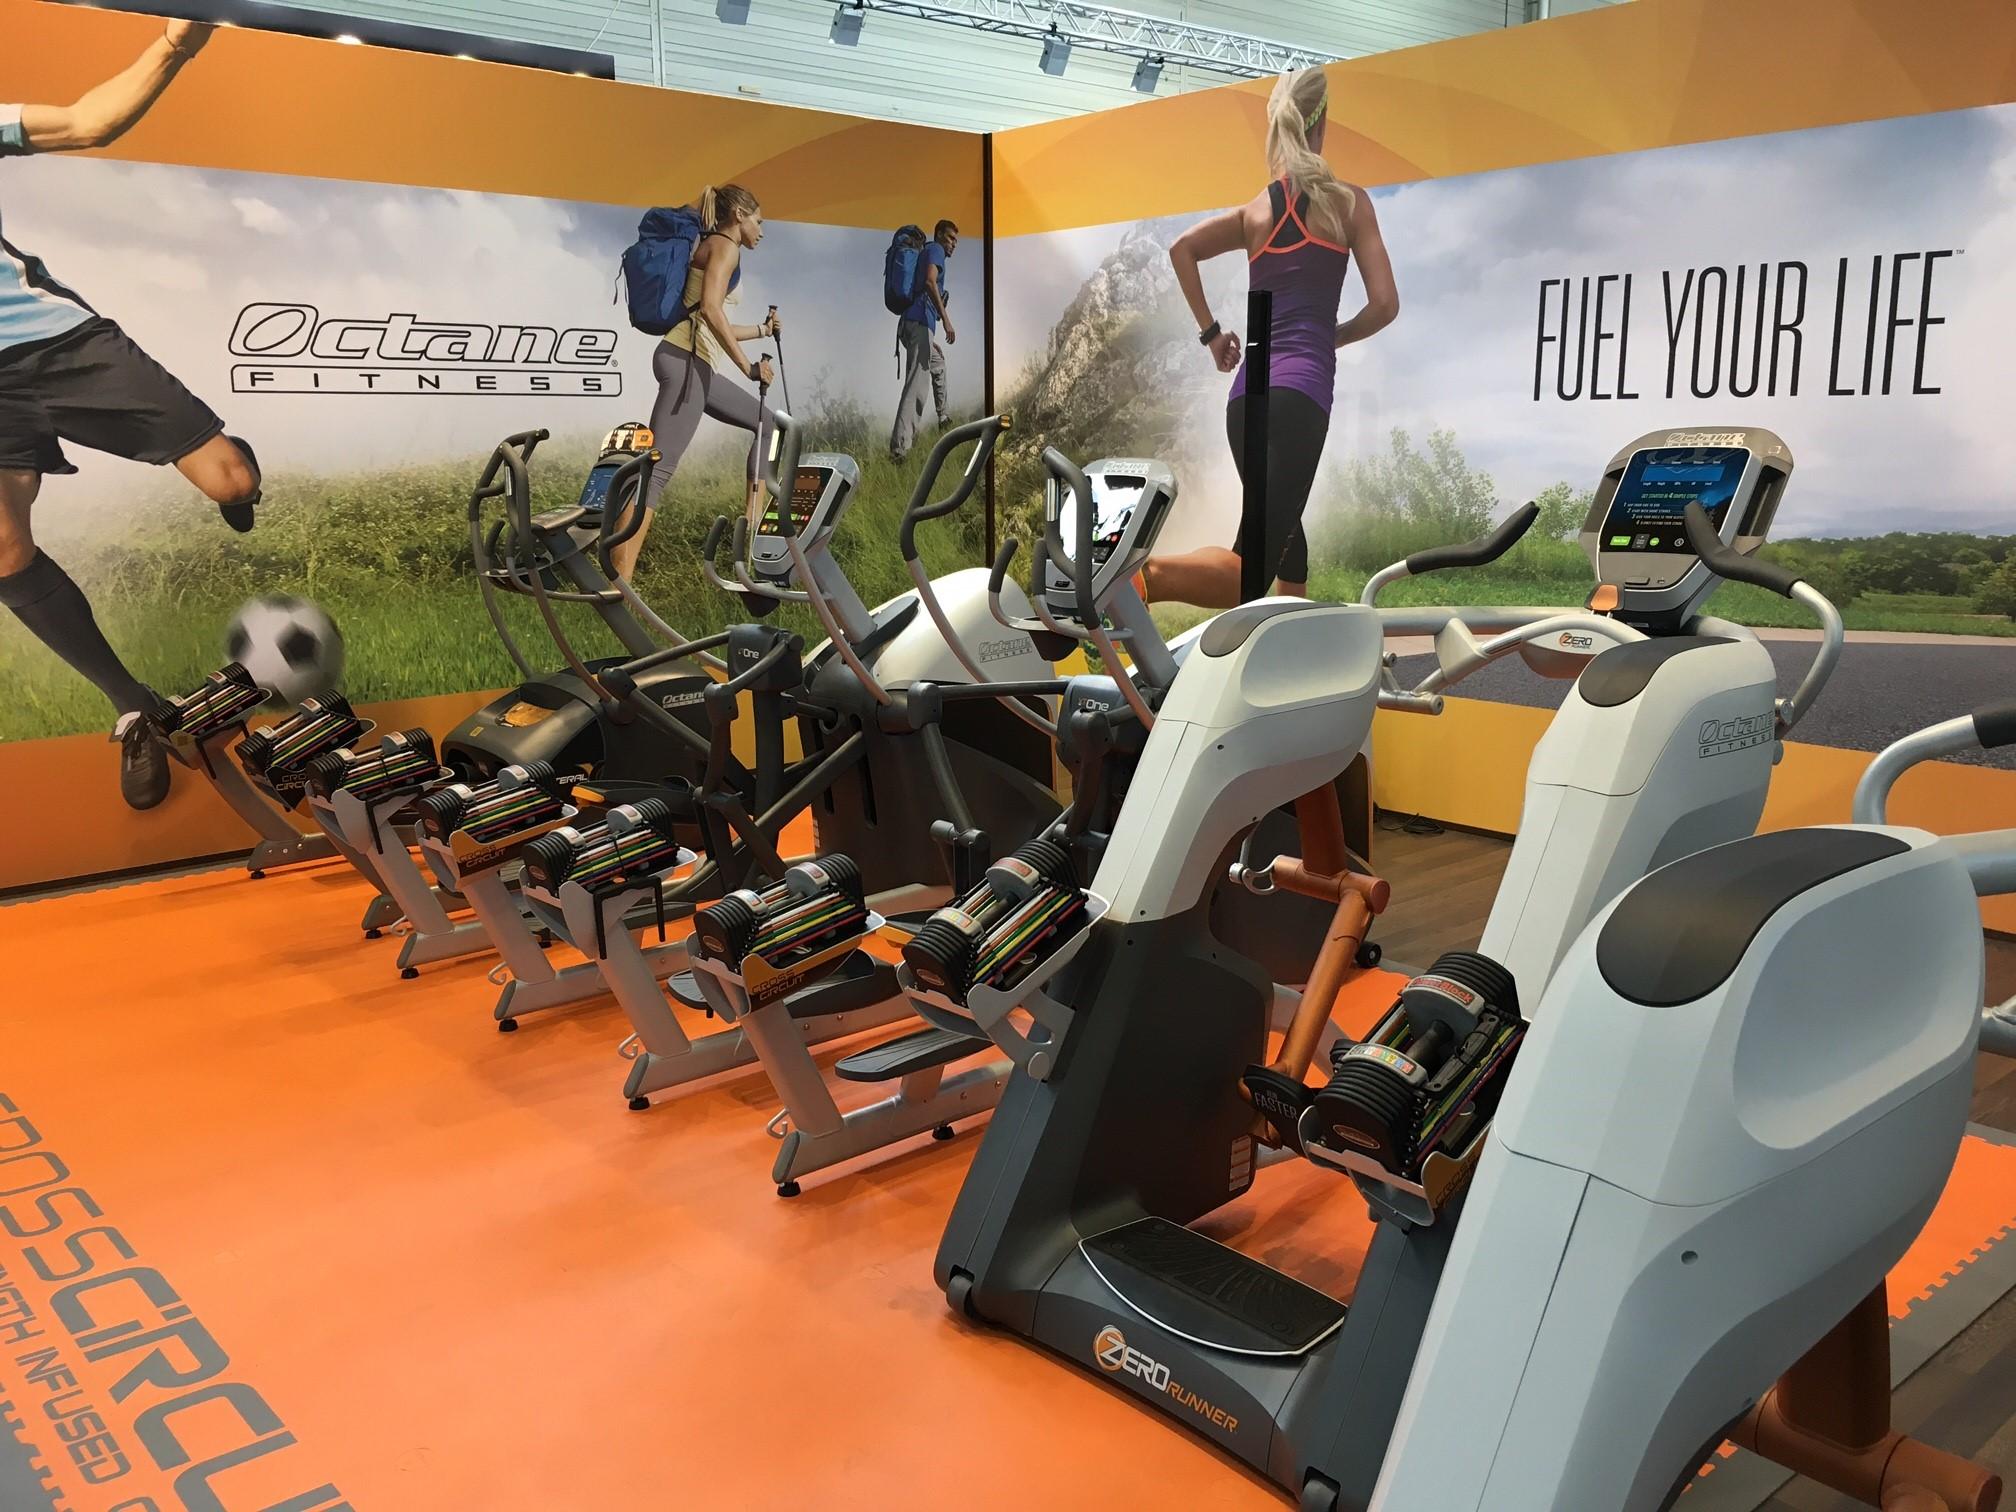 A row of exercise bikes